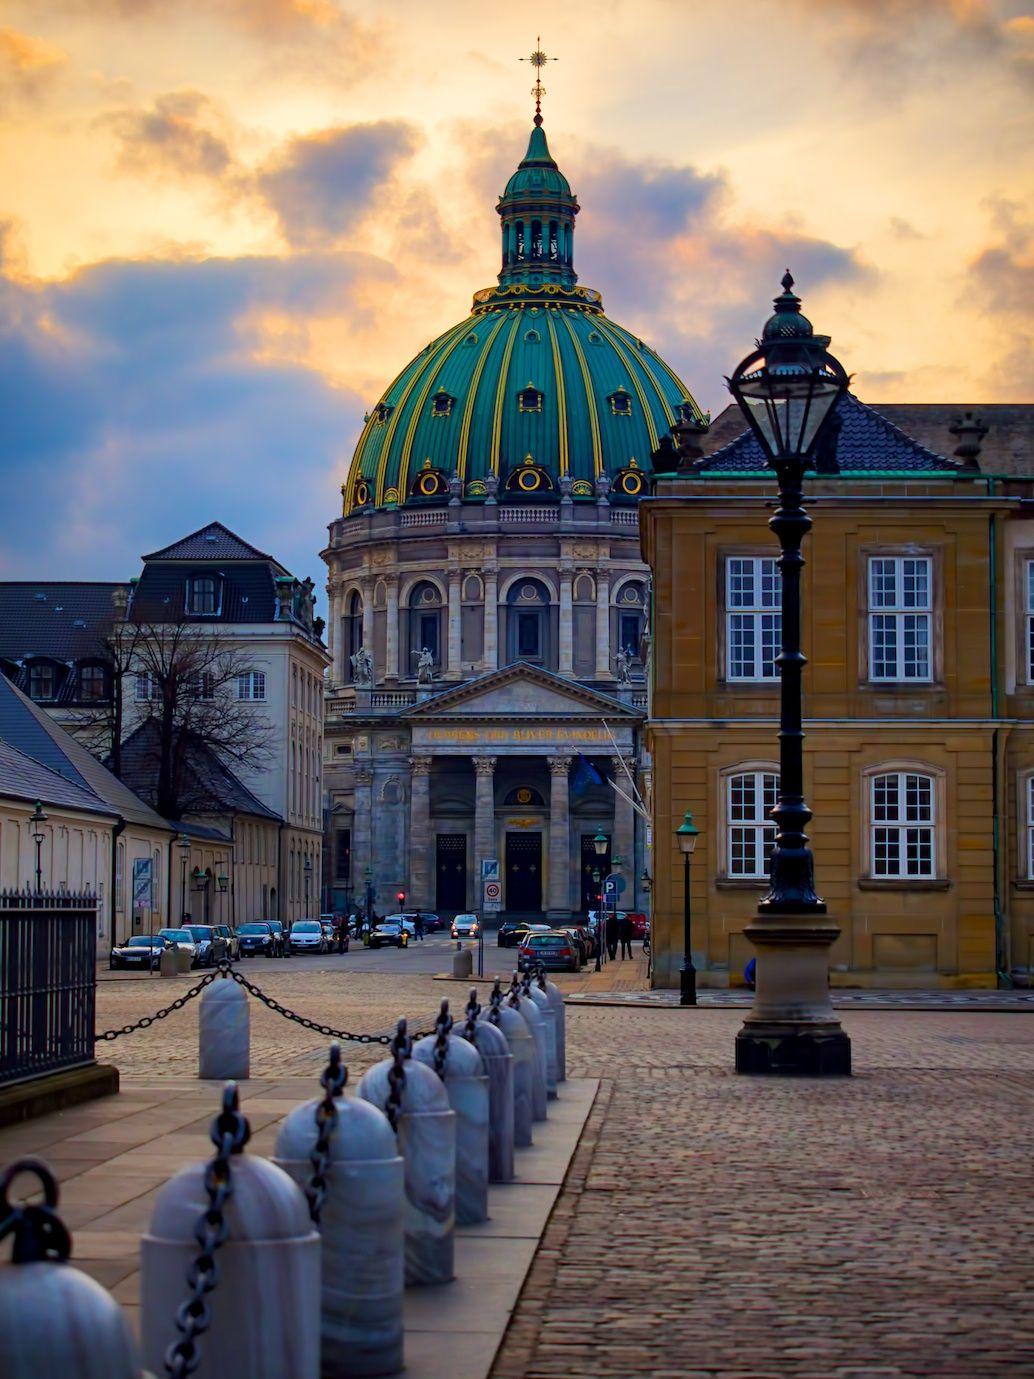 I caught a fabulous sunset in Copenhagen recently, while wandering around Amalienborg Palace...